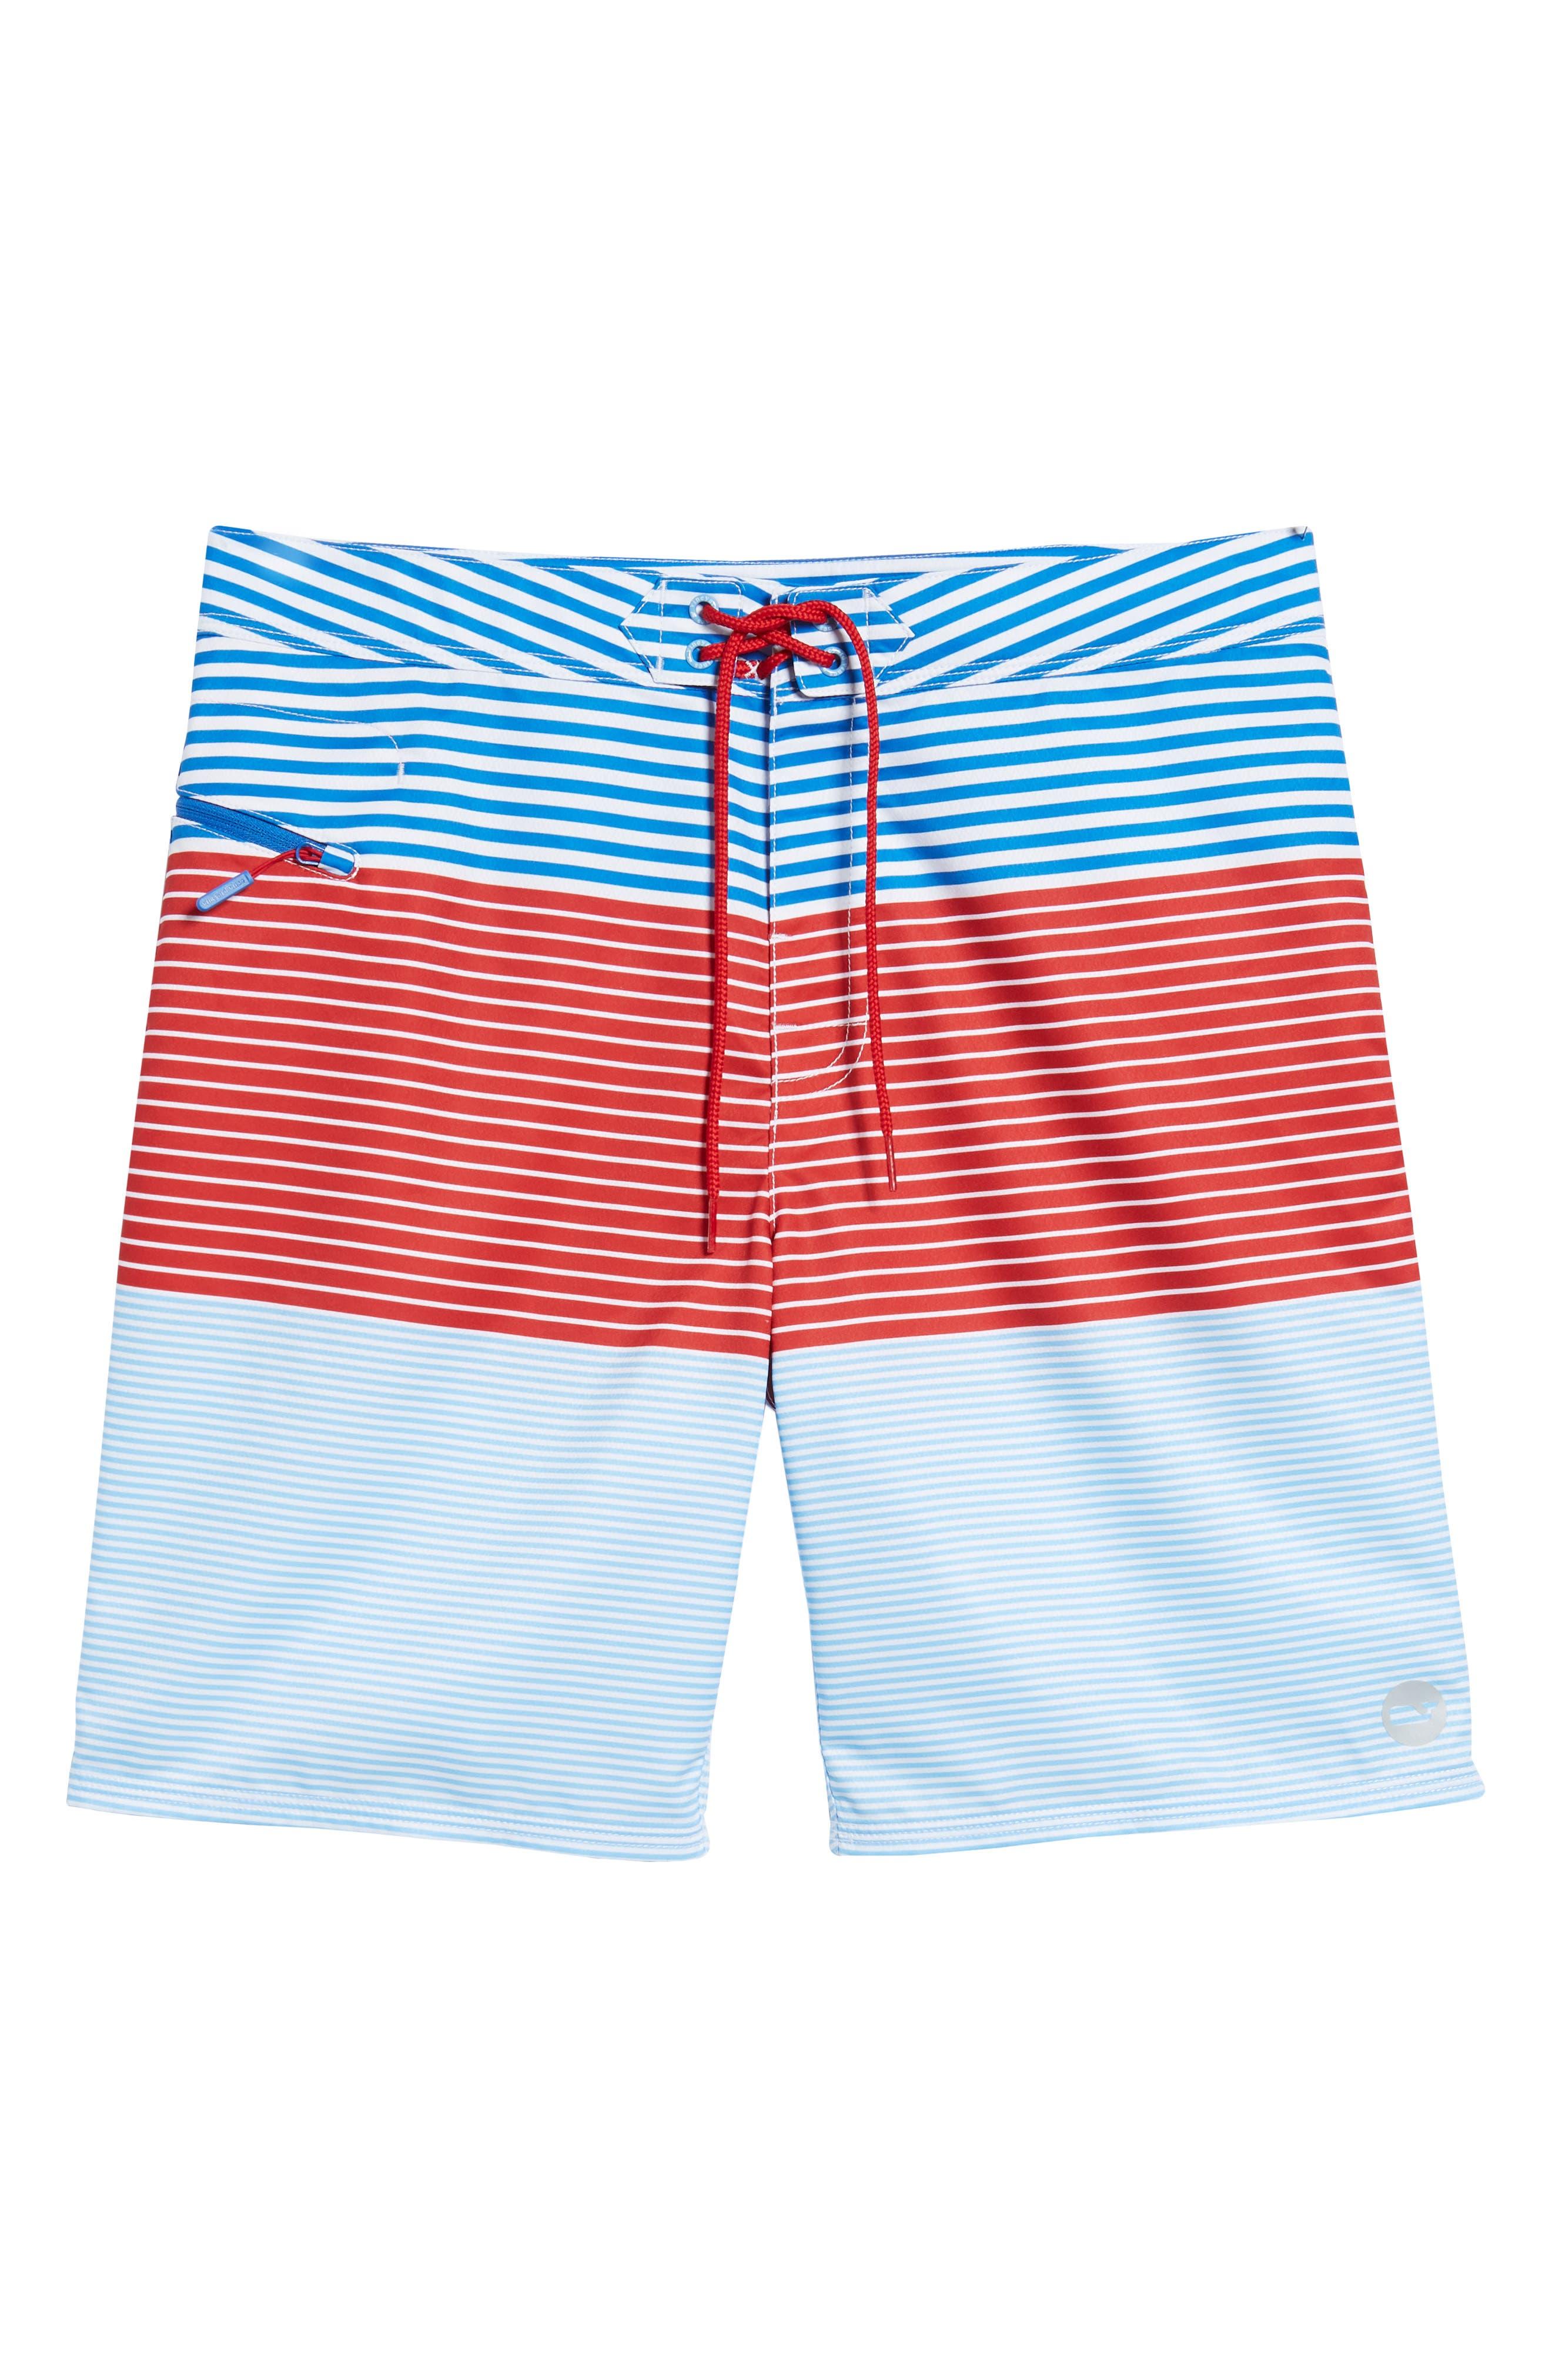 Whale Harbor Stripe Board Shorts,                             Alternate thumbnail 6, color,                             Spinnaker